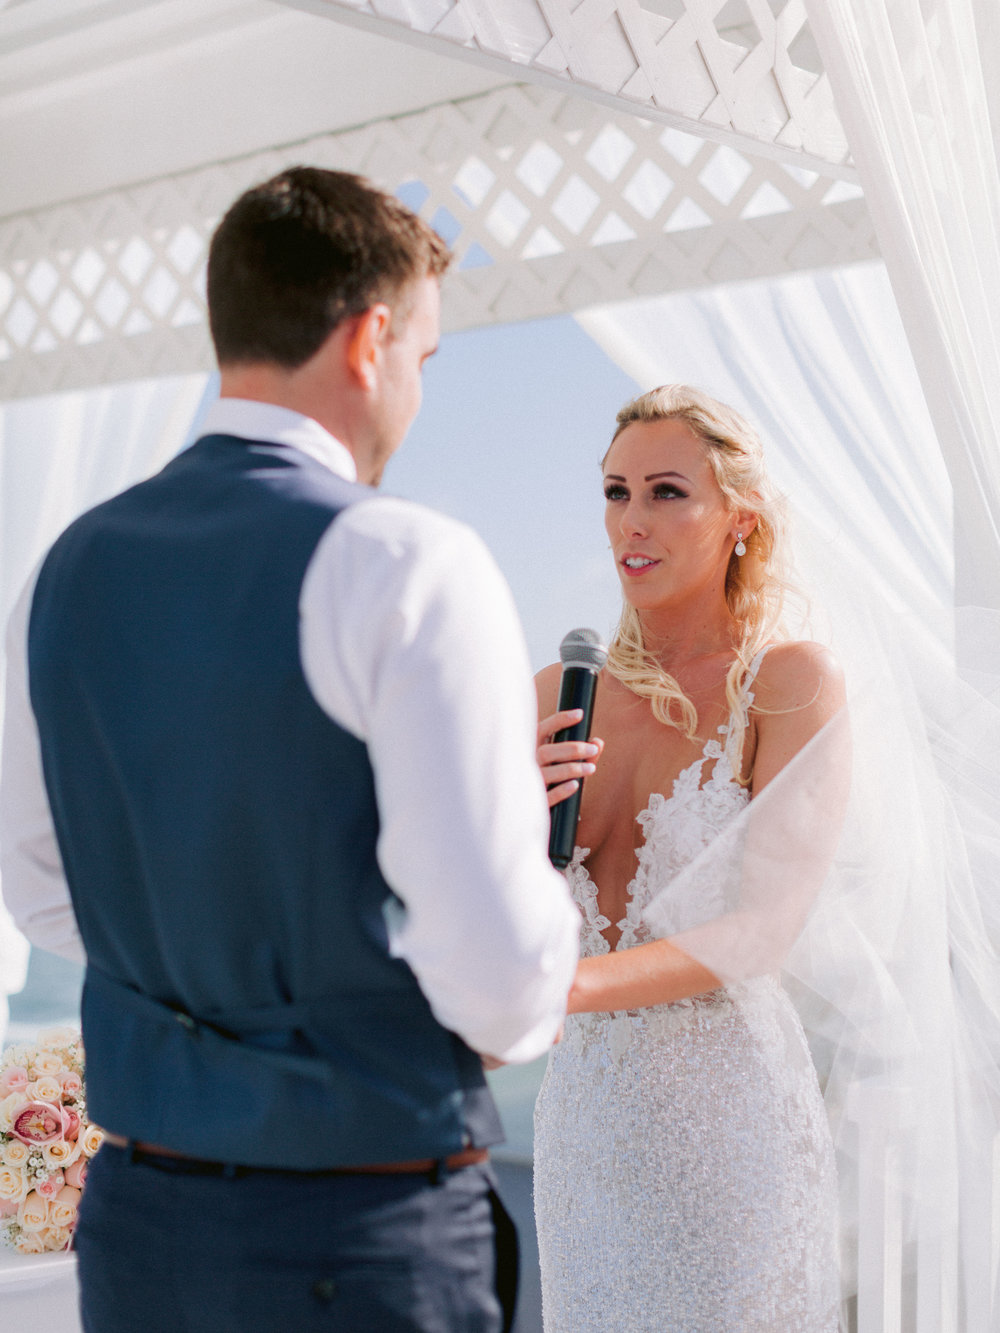 Kim_Jeff_Cancun Wedding_Ceremony_Kurtz_Orpia (78 of 119).jpg